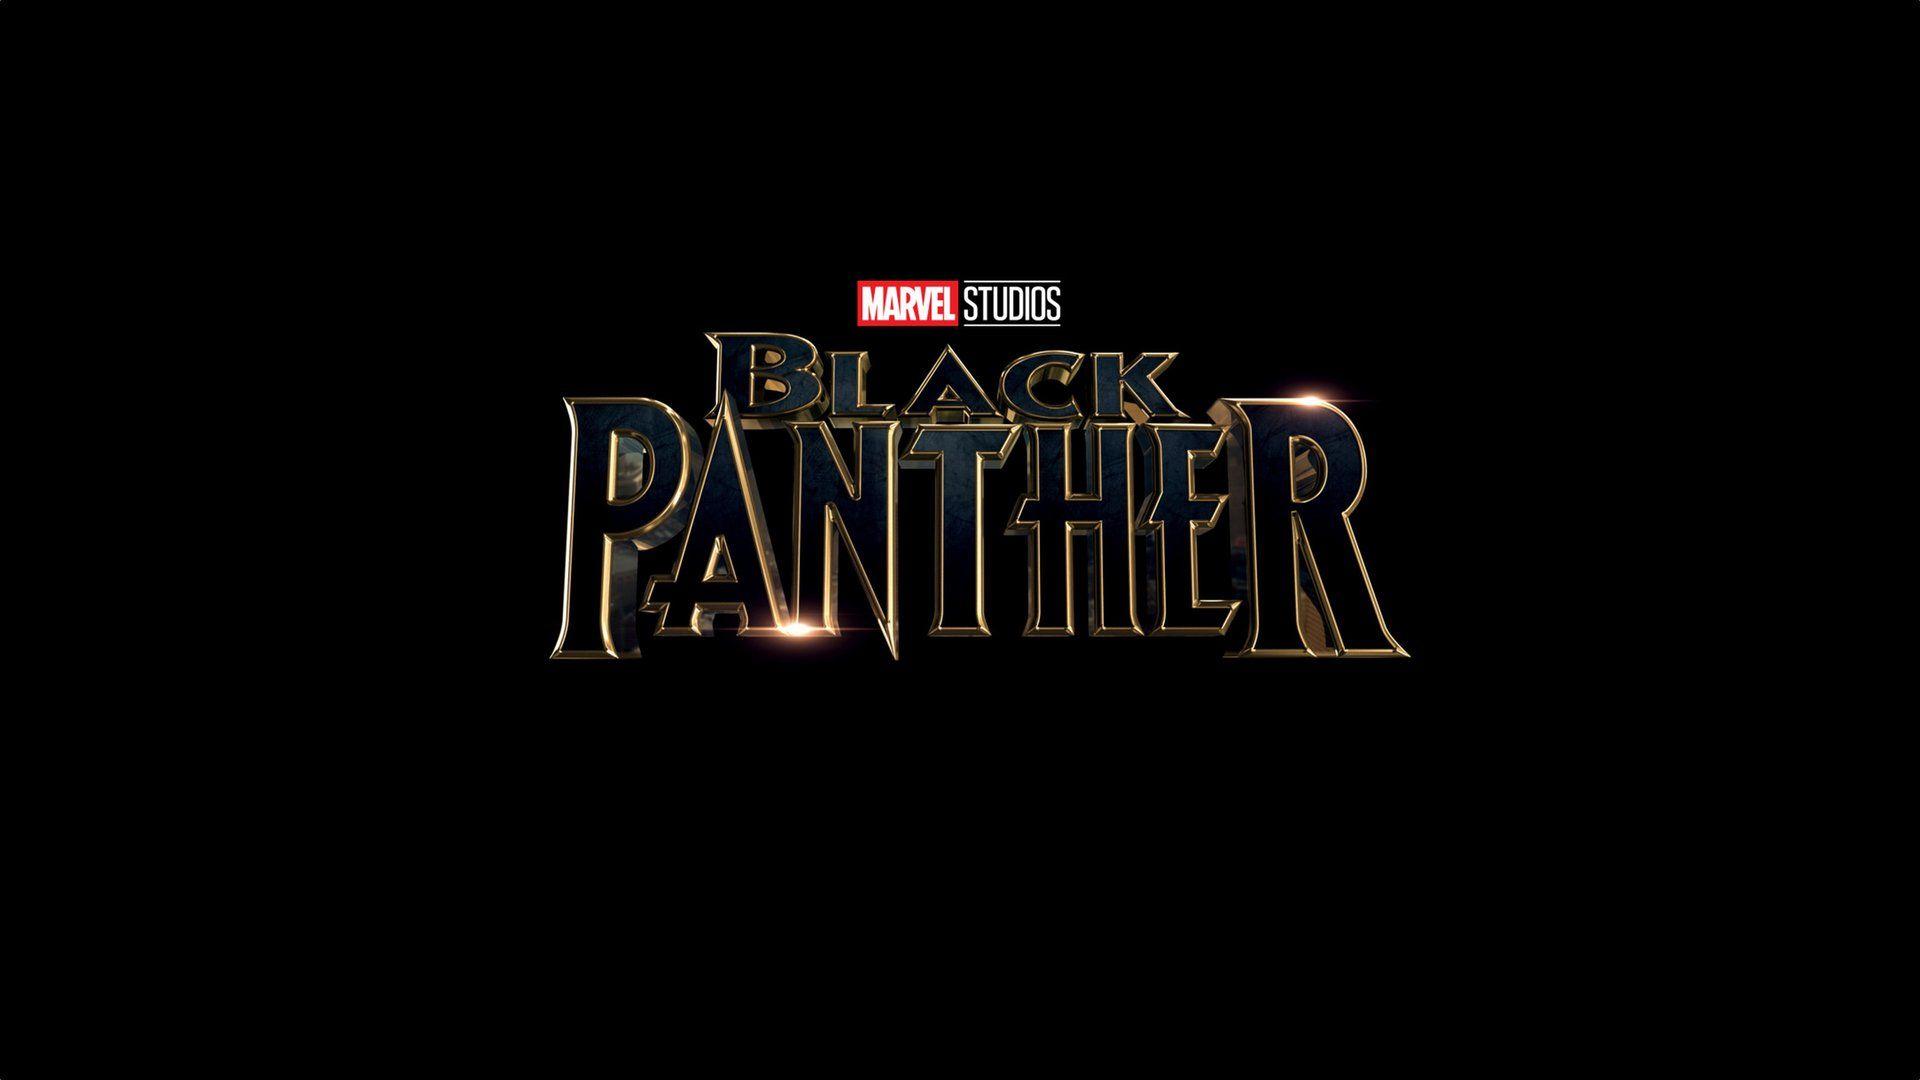 123.gomovies WATCH Black Panther FULL|MOVIE 2018 [ONLINE] Regarder Streaming ,